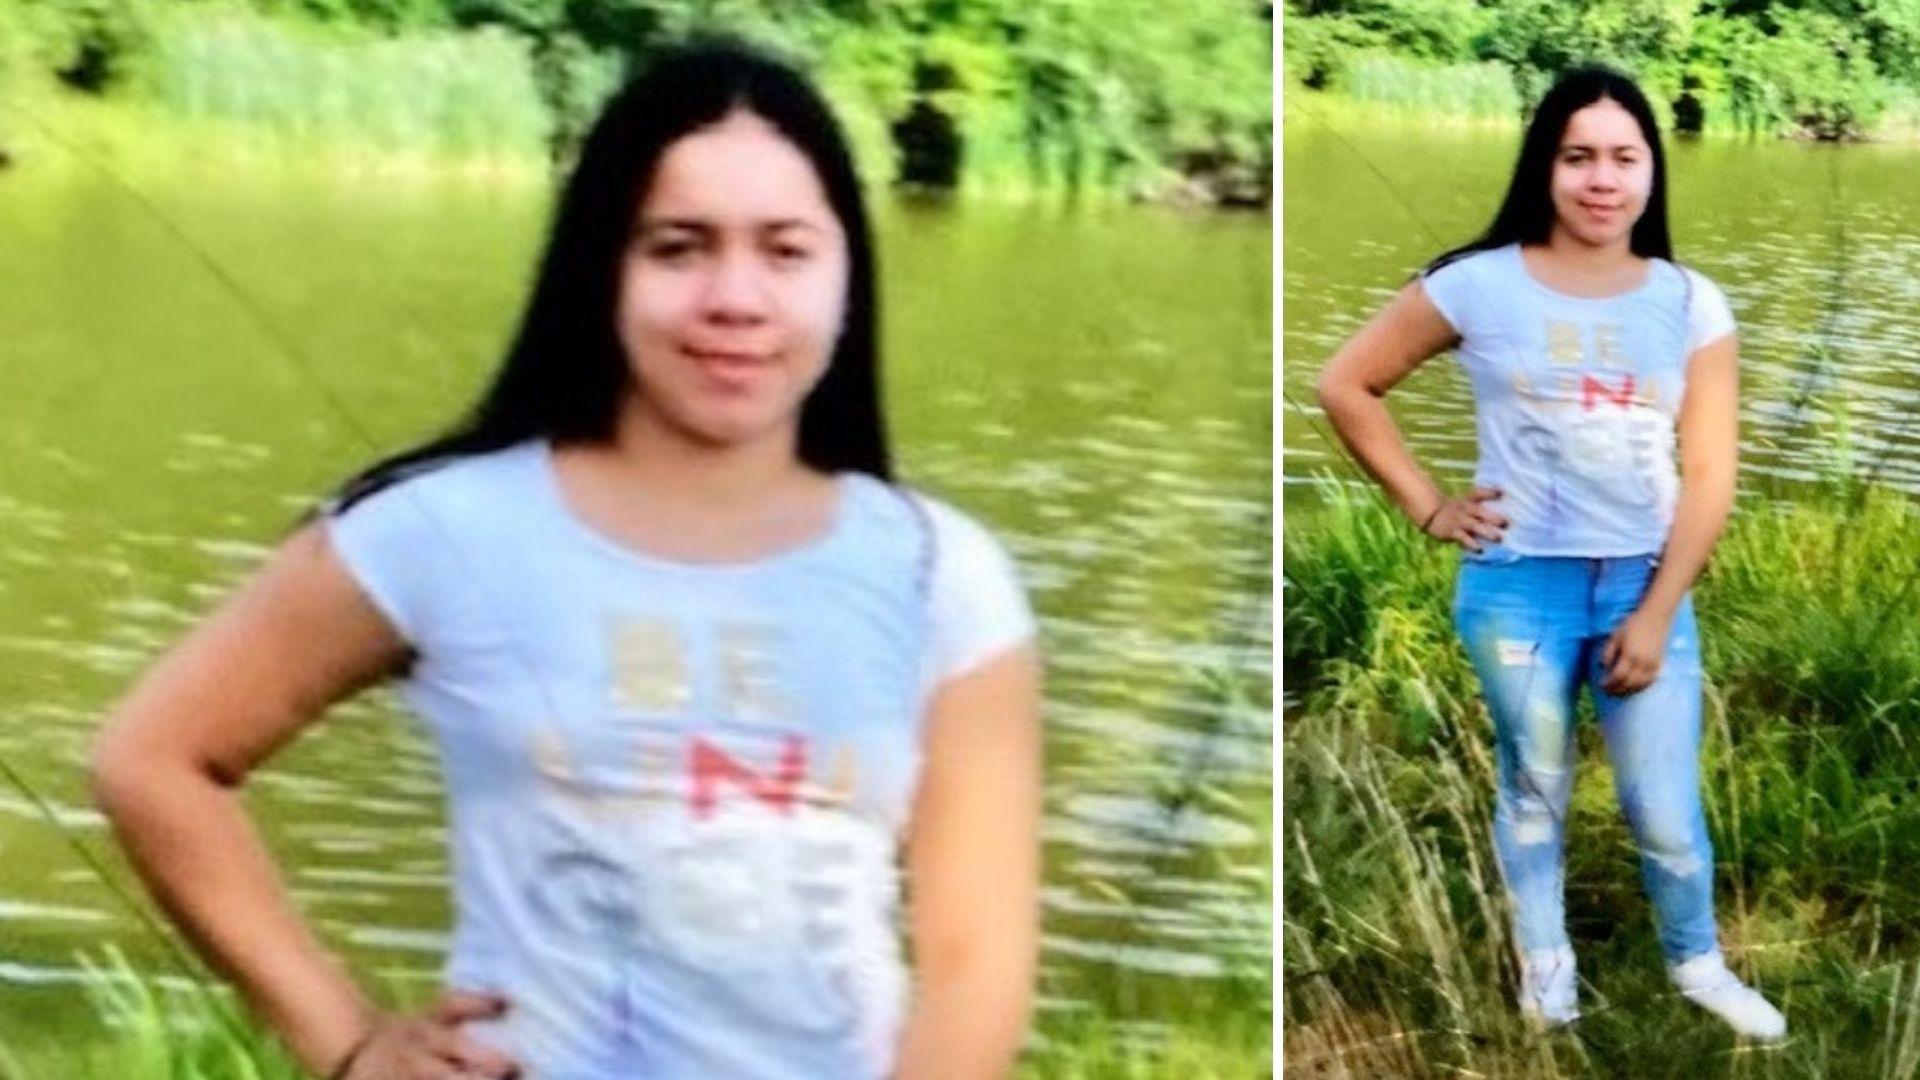 Missing Bronx girl Brandy Zelaya